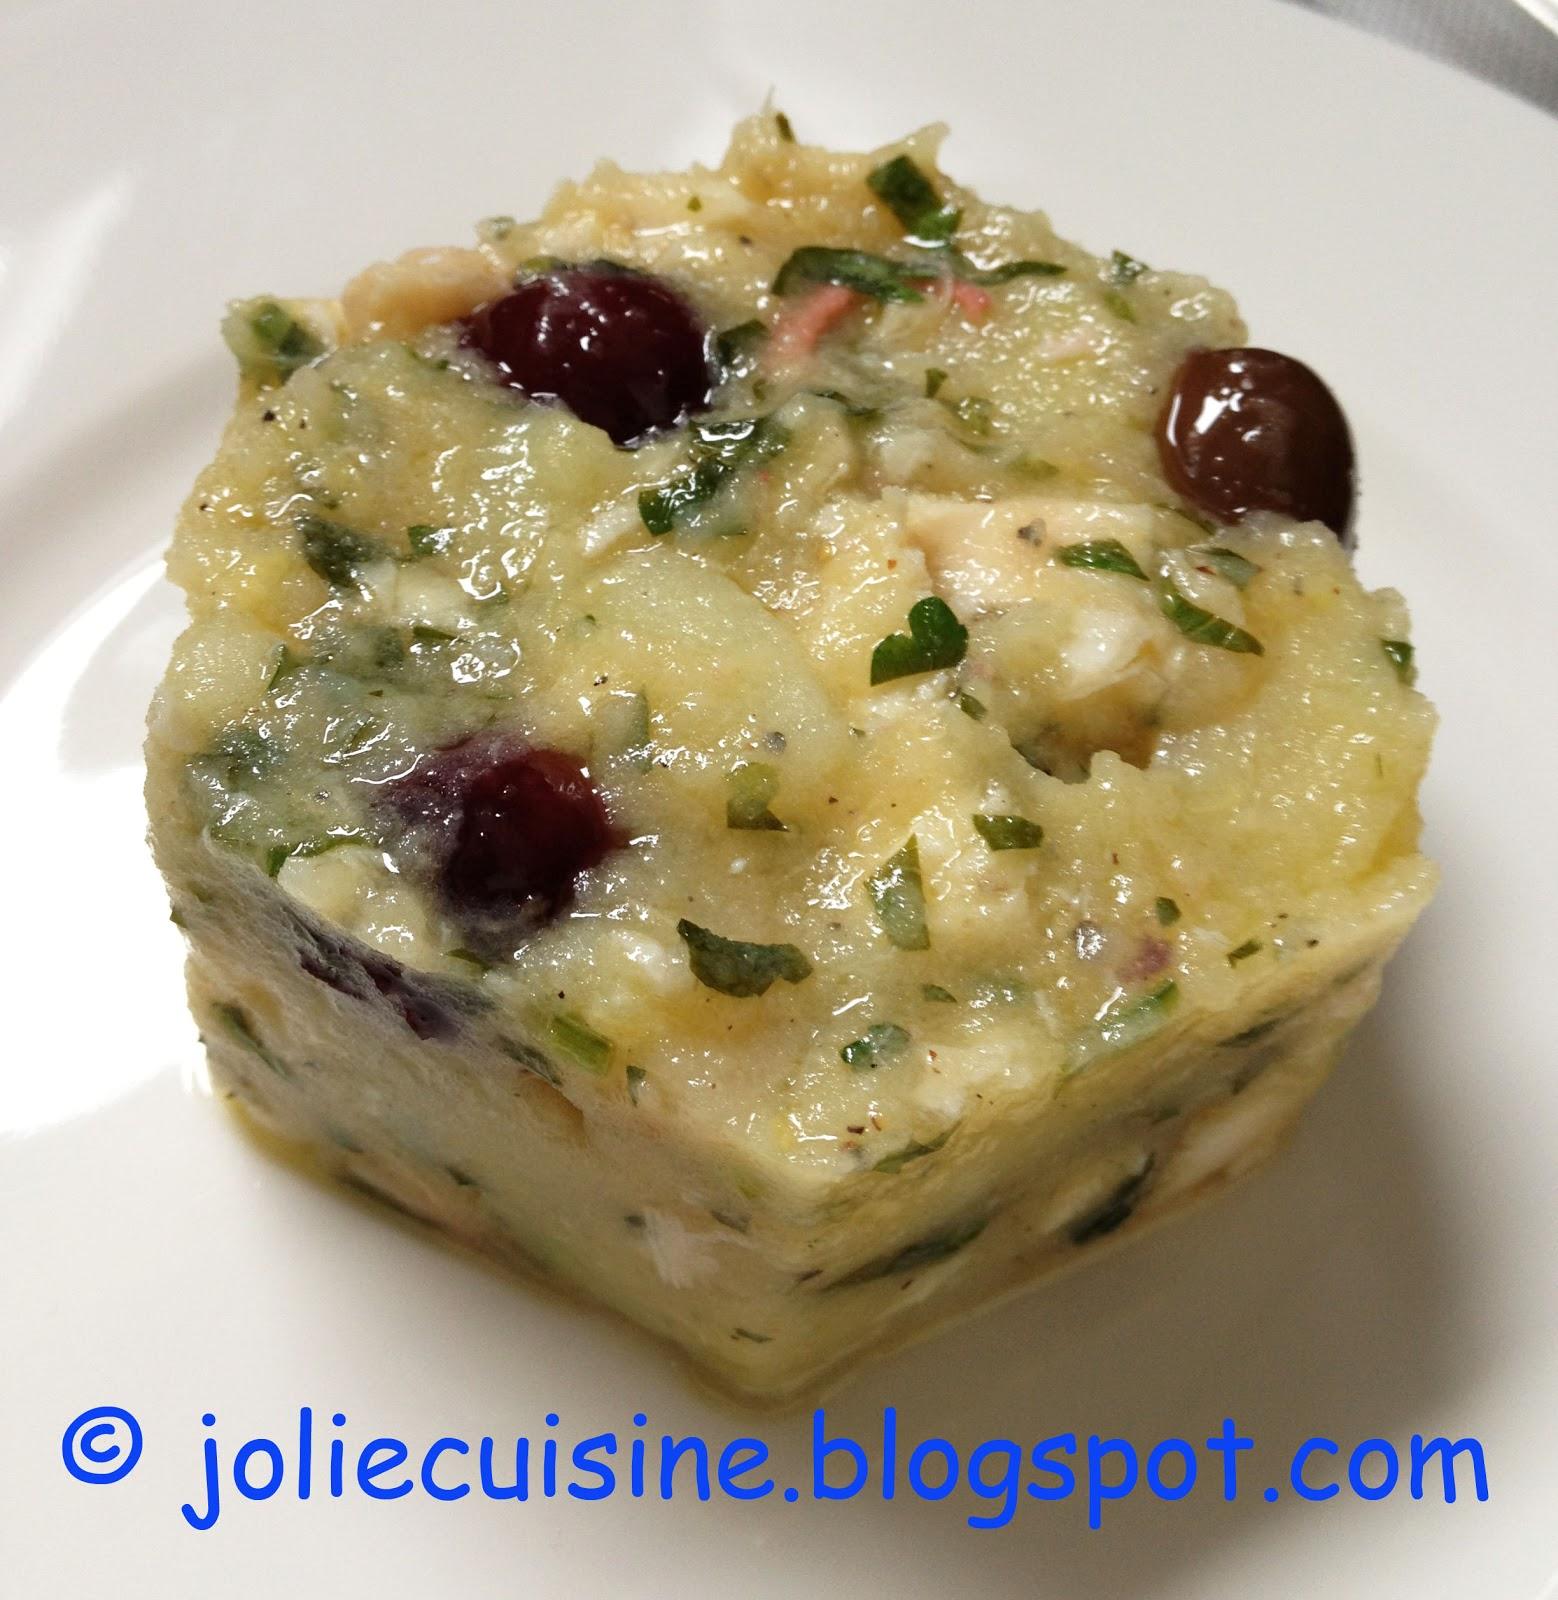 Jolie cuisine tortino tiepido di polipo e patate - Jolie cuisine ...